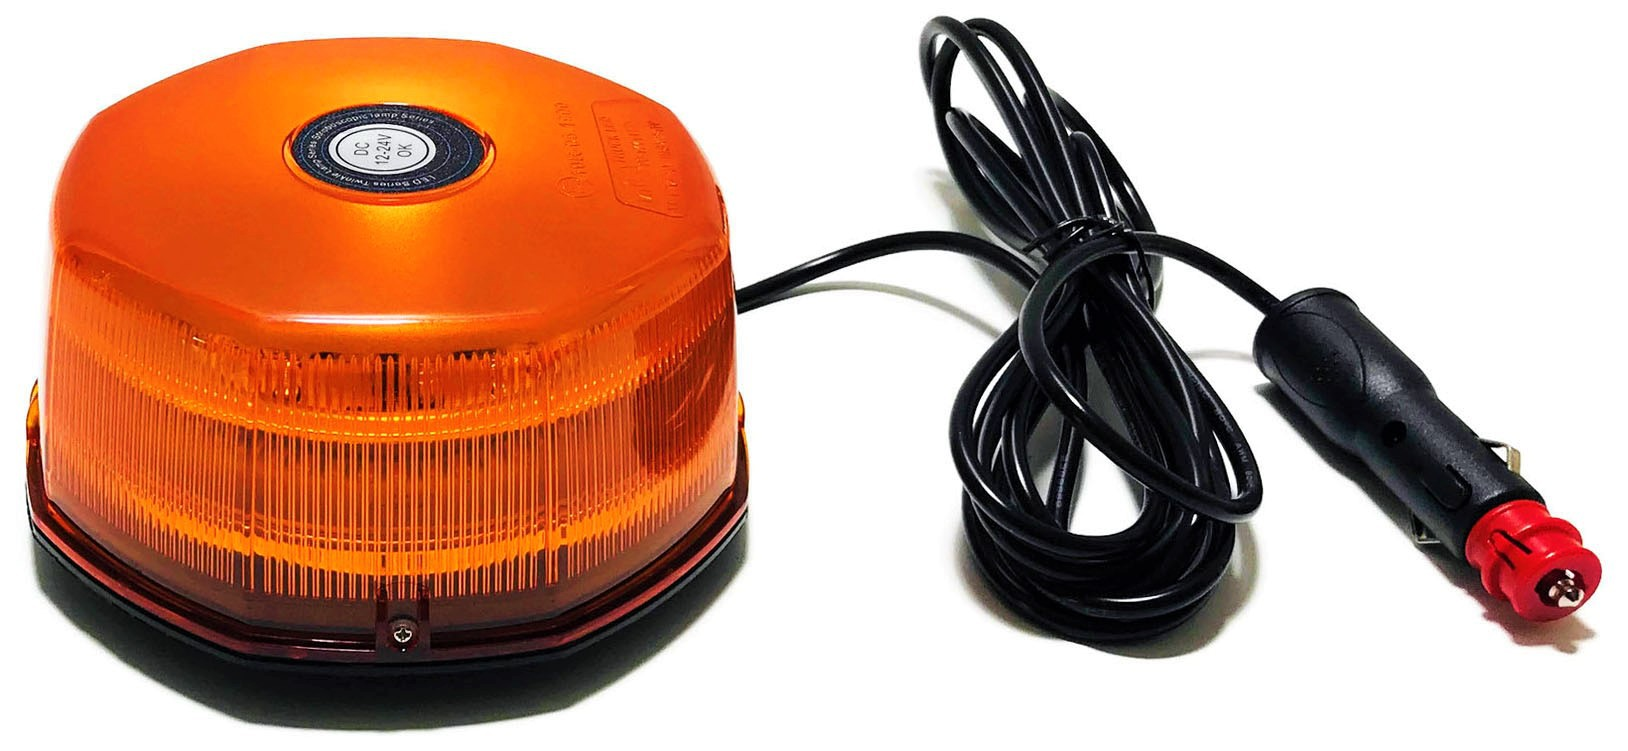 KOGUT LED OCTAGON LAMPA OSTRZEGAWCZA MAGNES 12 24V